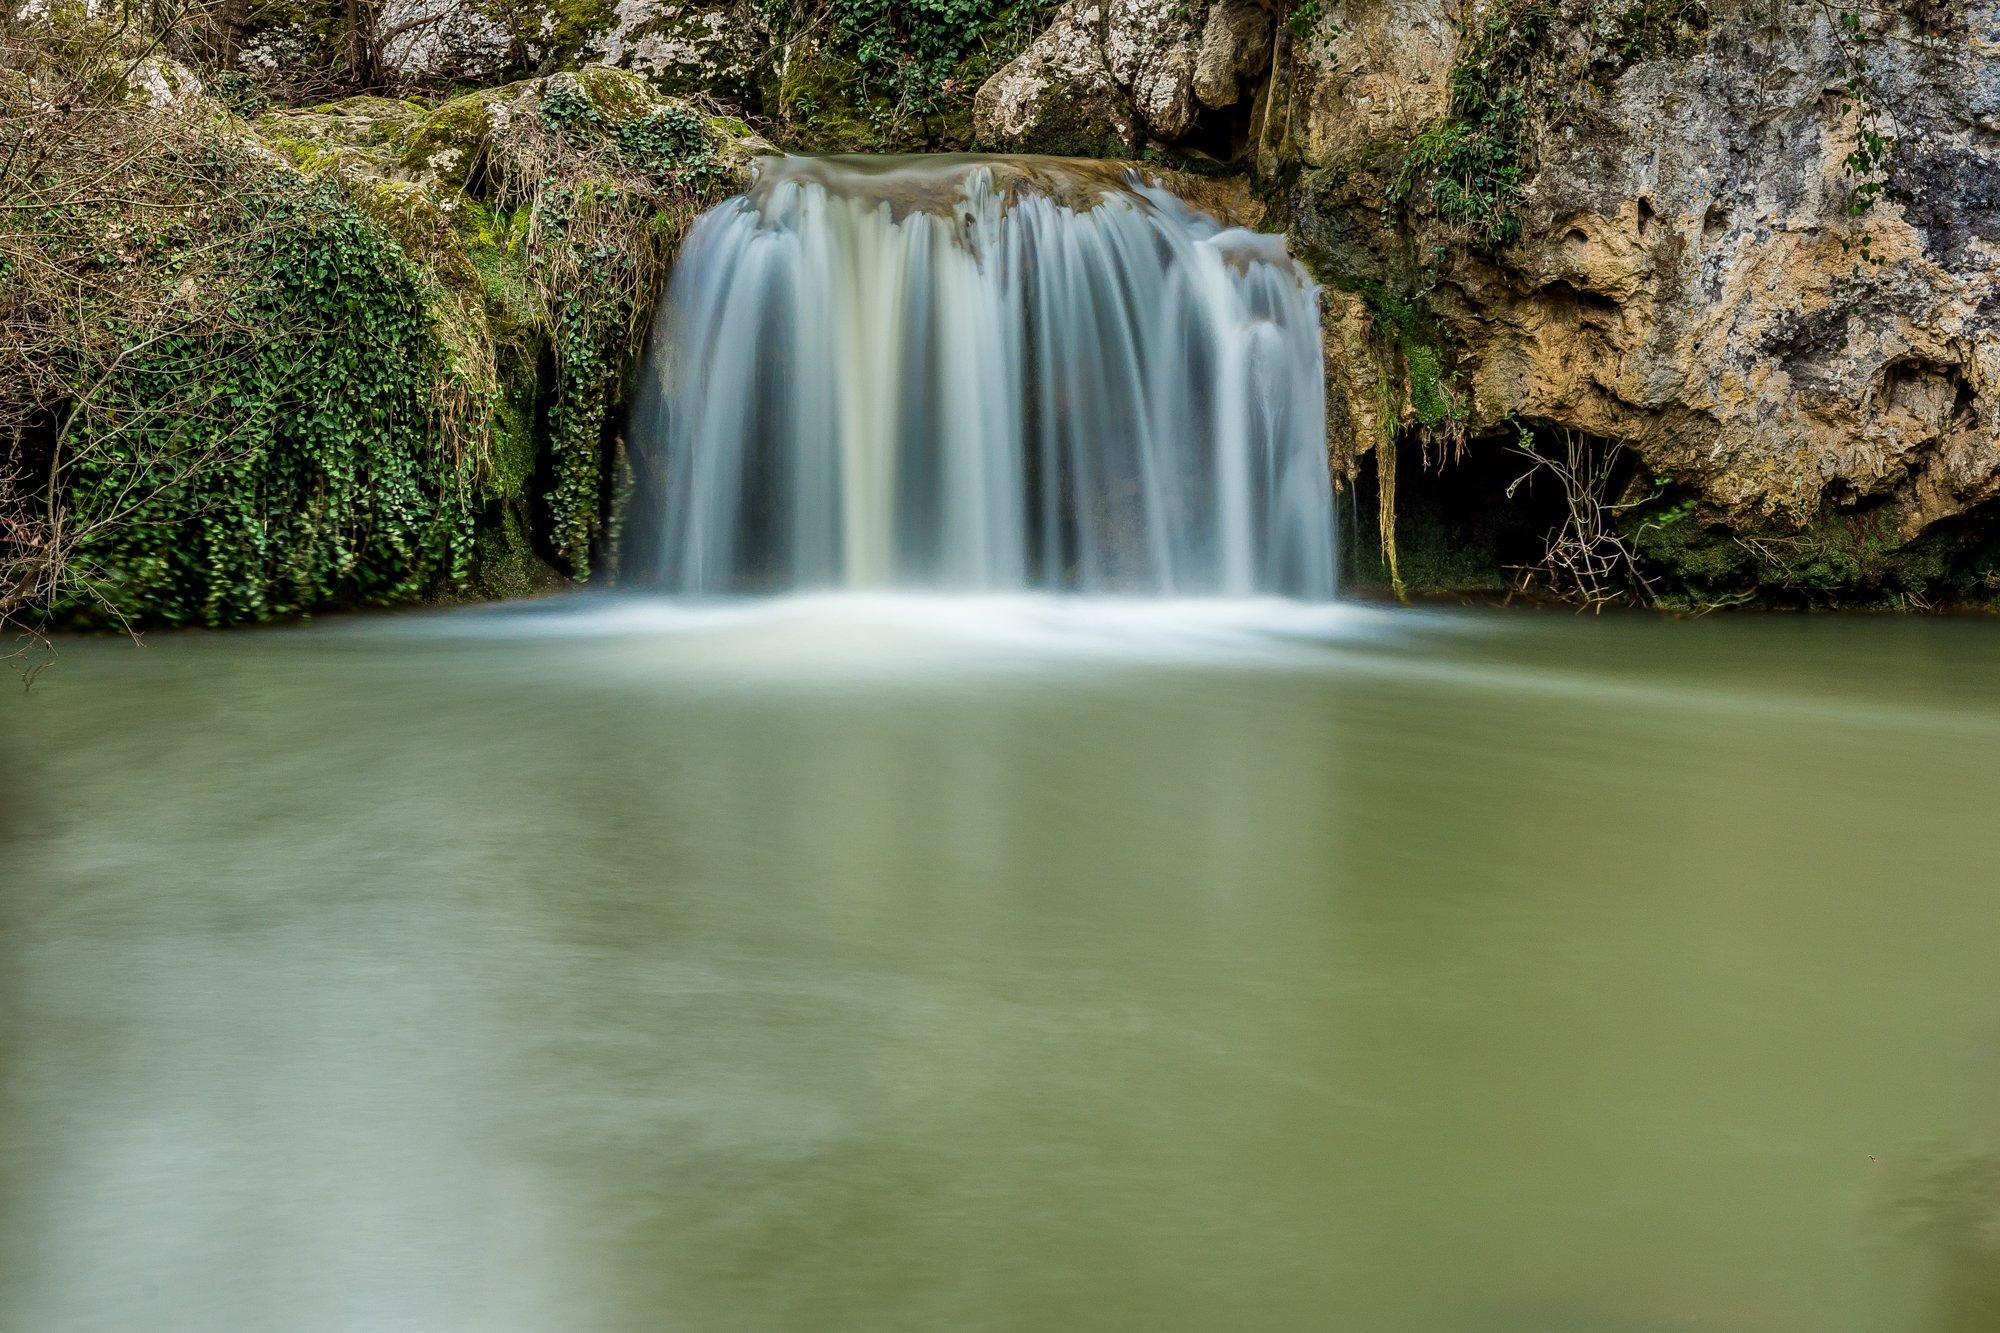 #landscape, #travel, #water, #nature, #lake, #spring, #nikon, #rock, Nikolay Nikolov